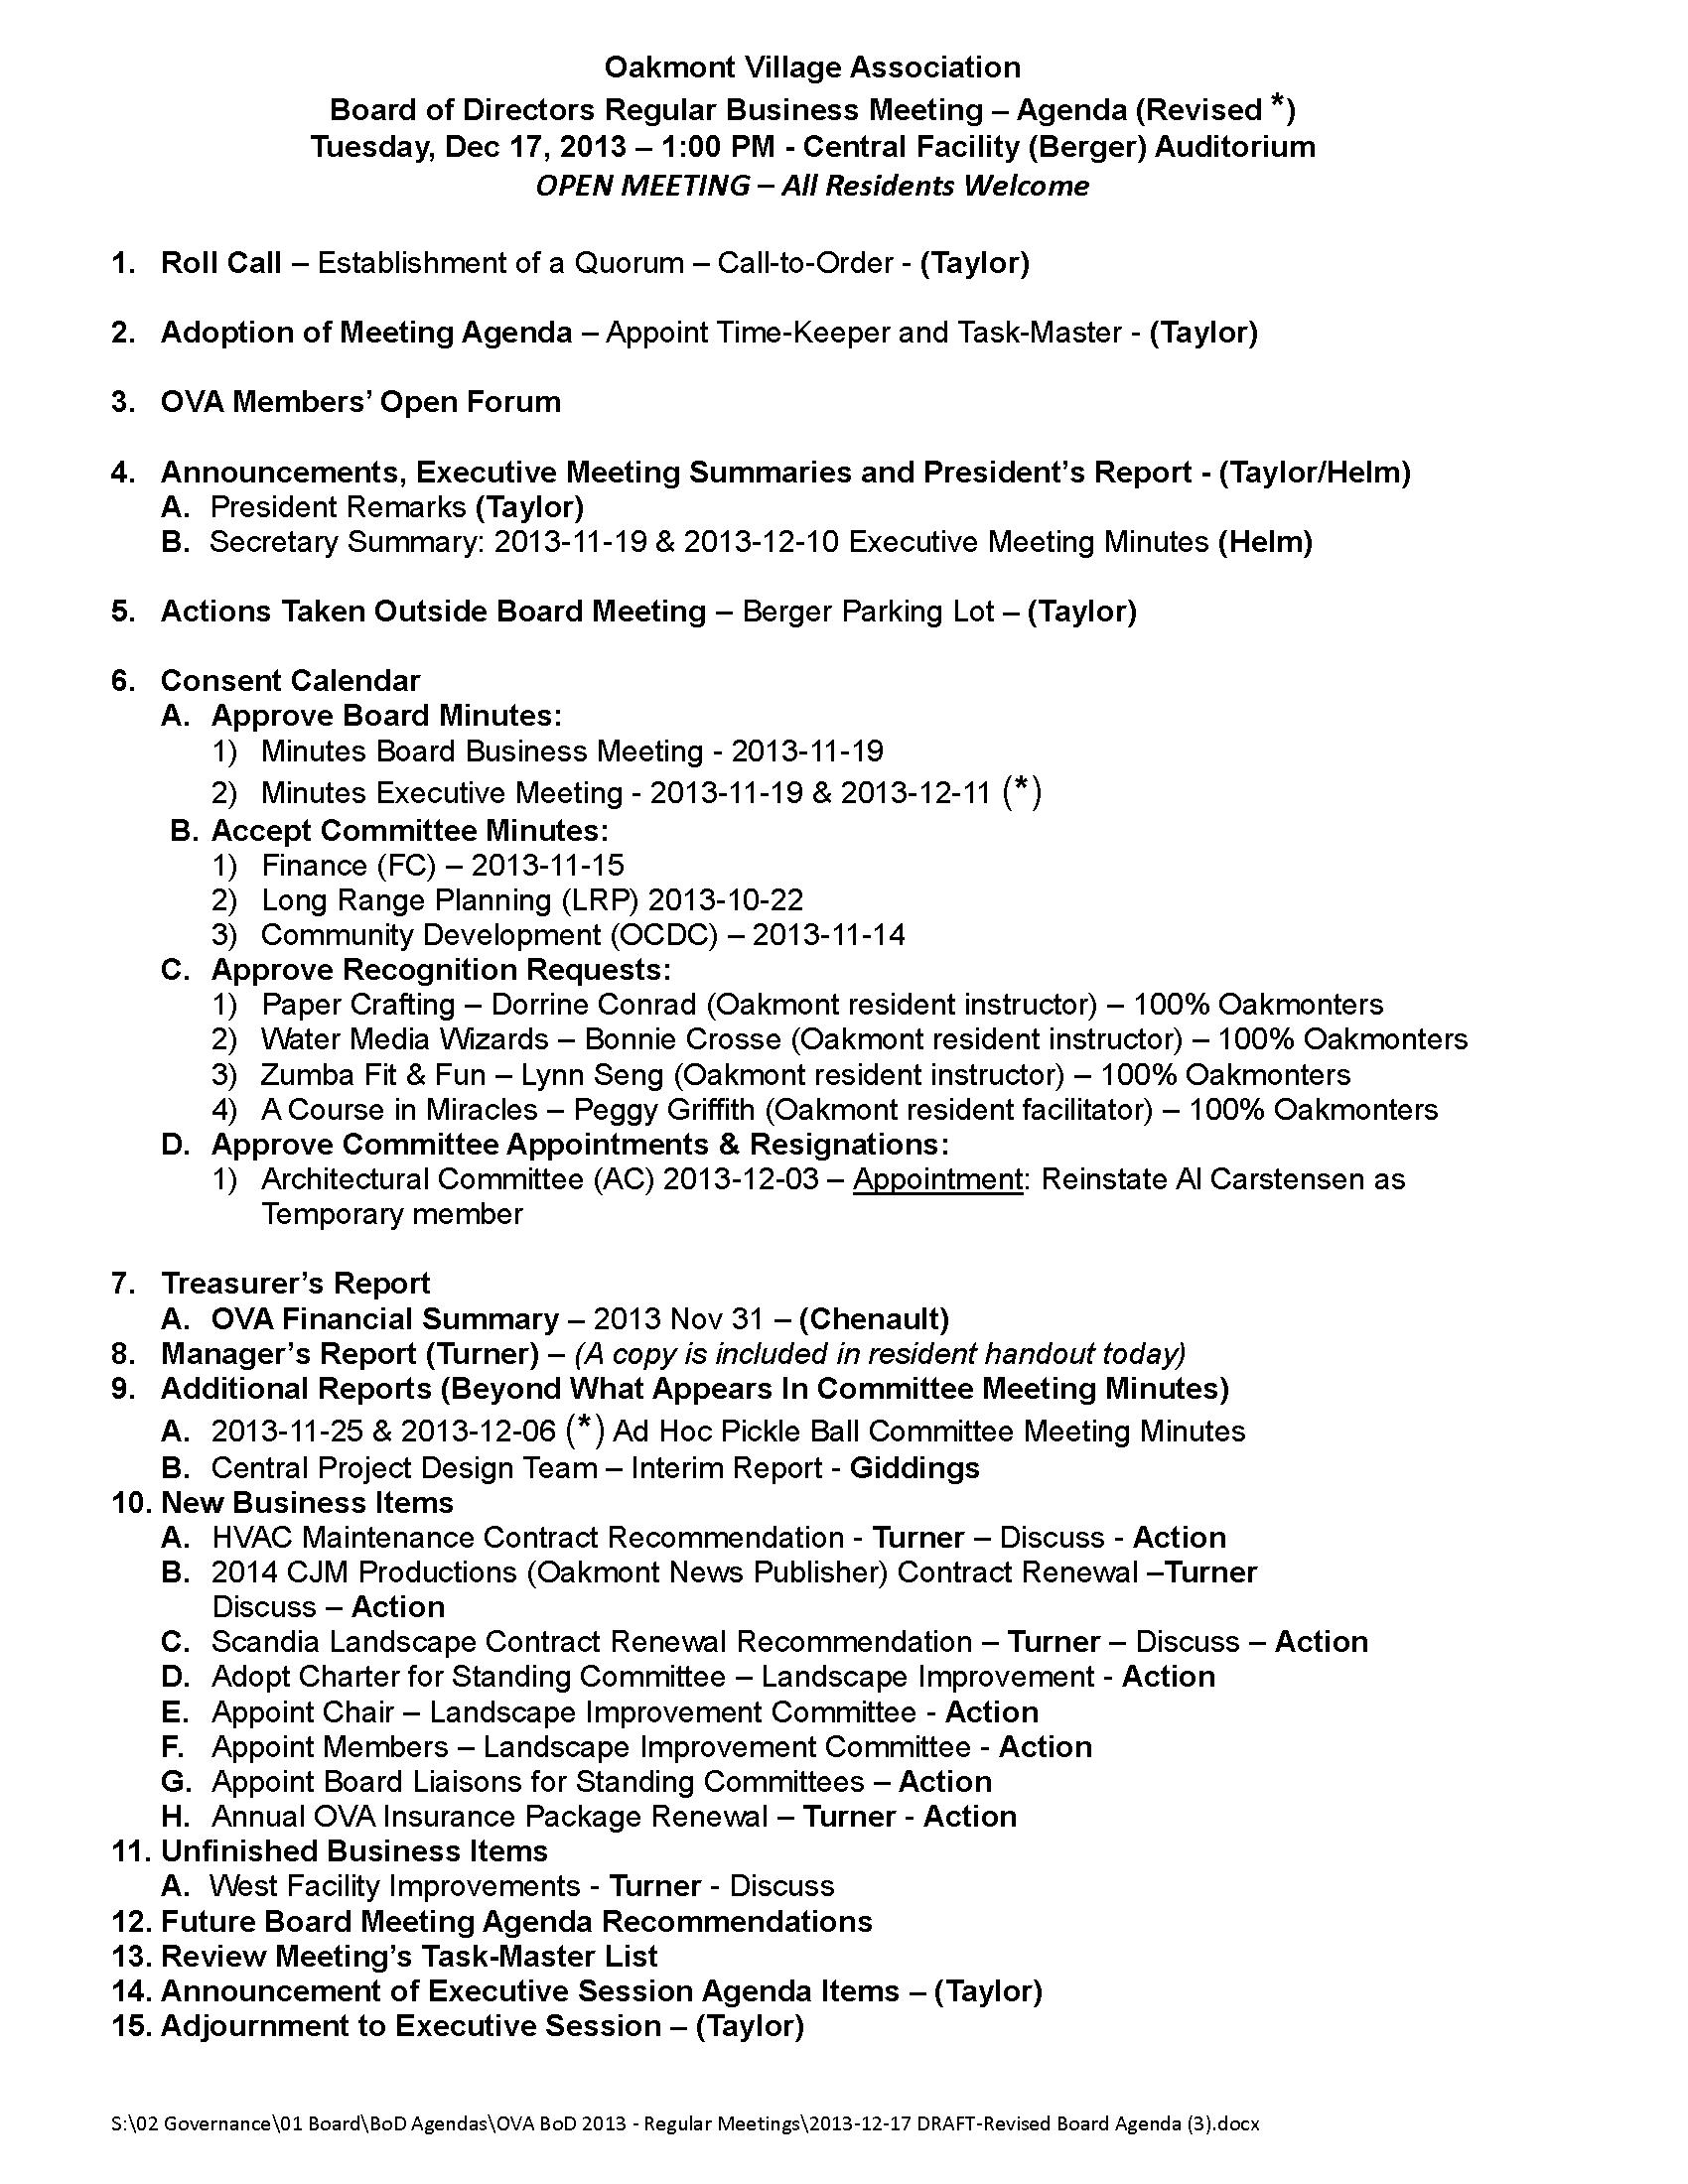 2013-12-17-Revised Board Agenda (3)